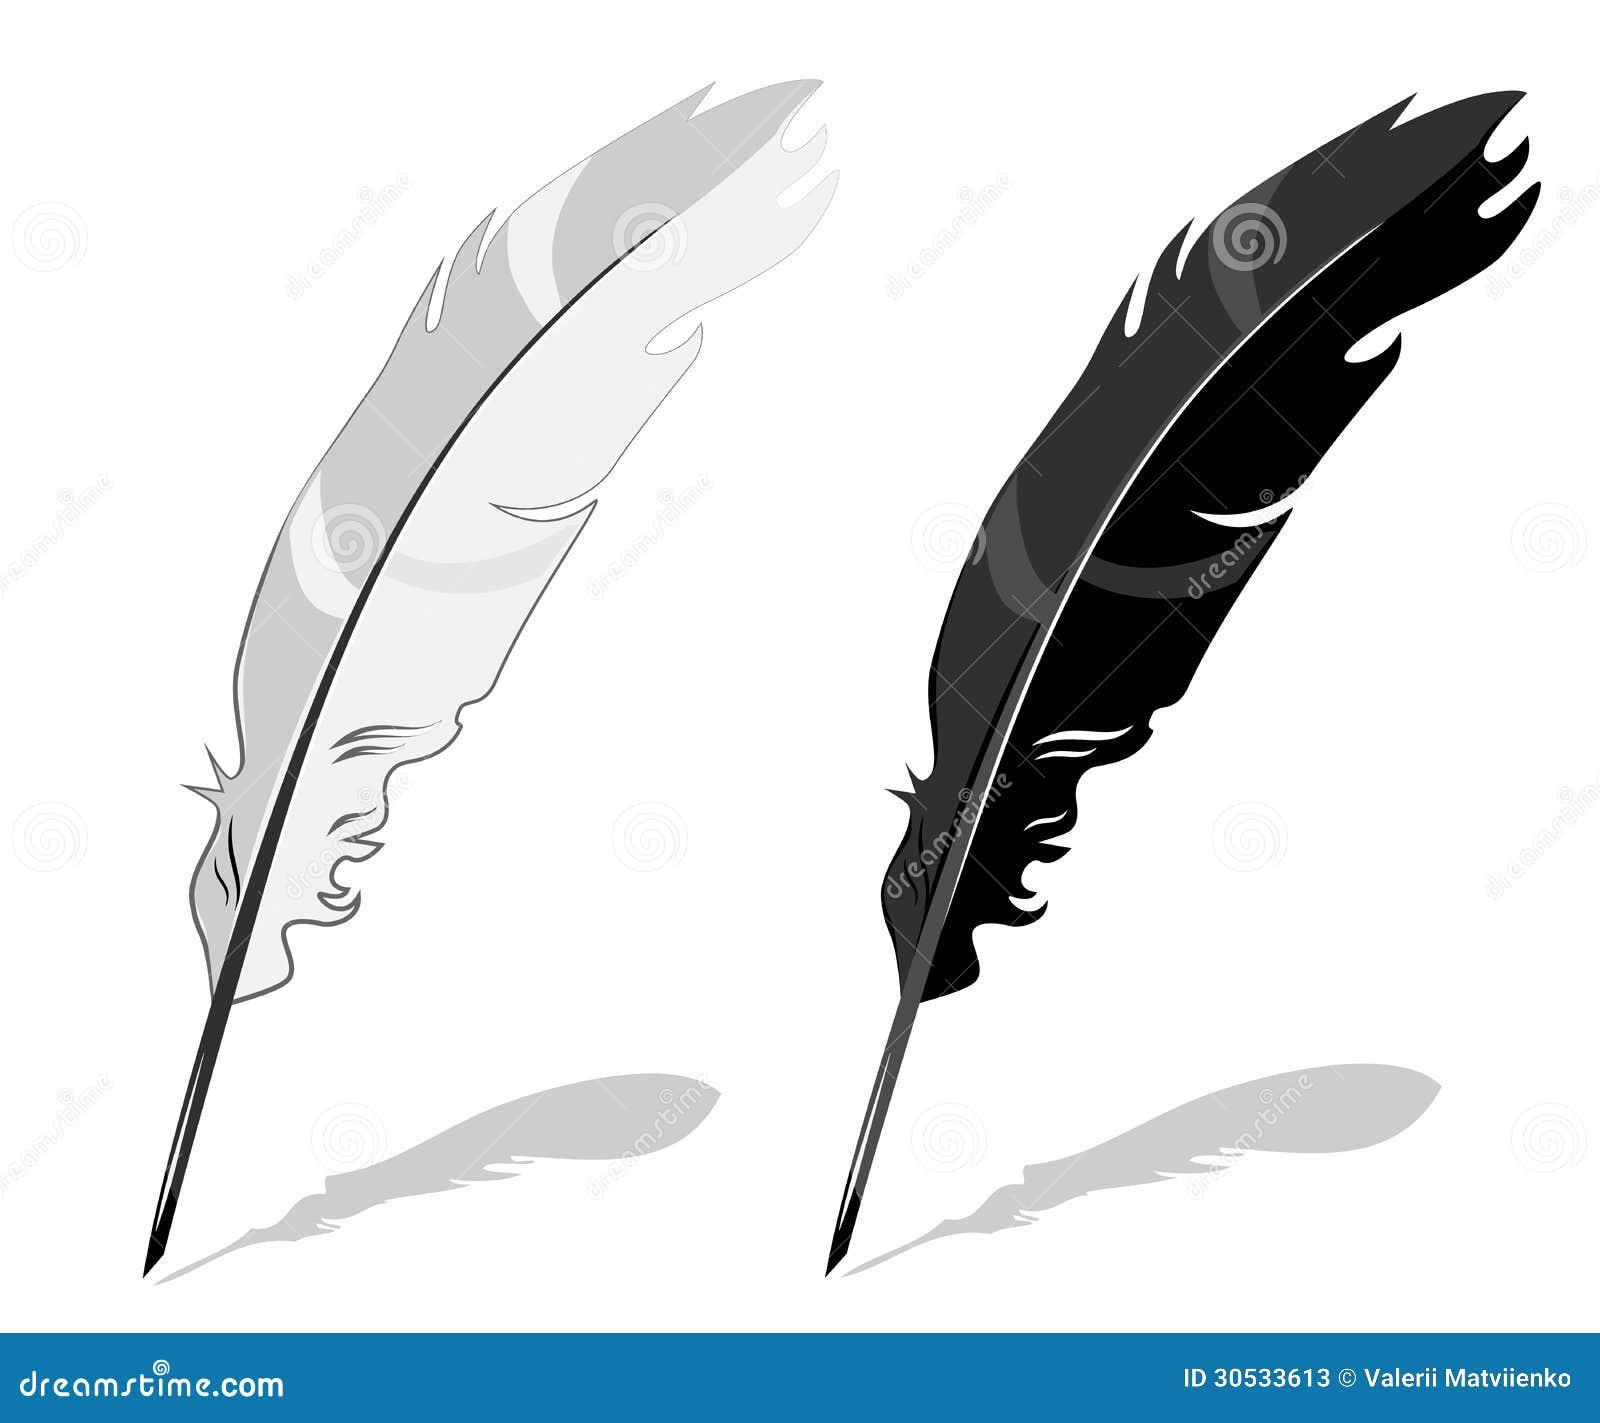 feather pen black and white stock photos image 30533613